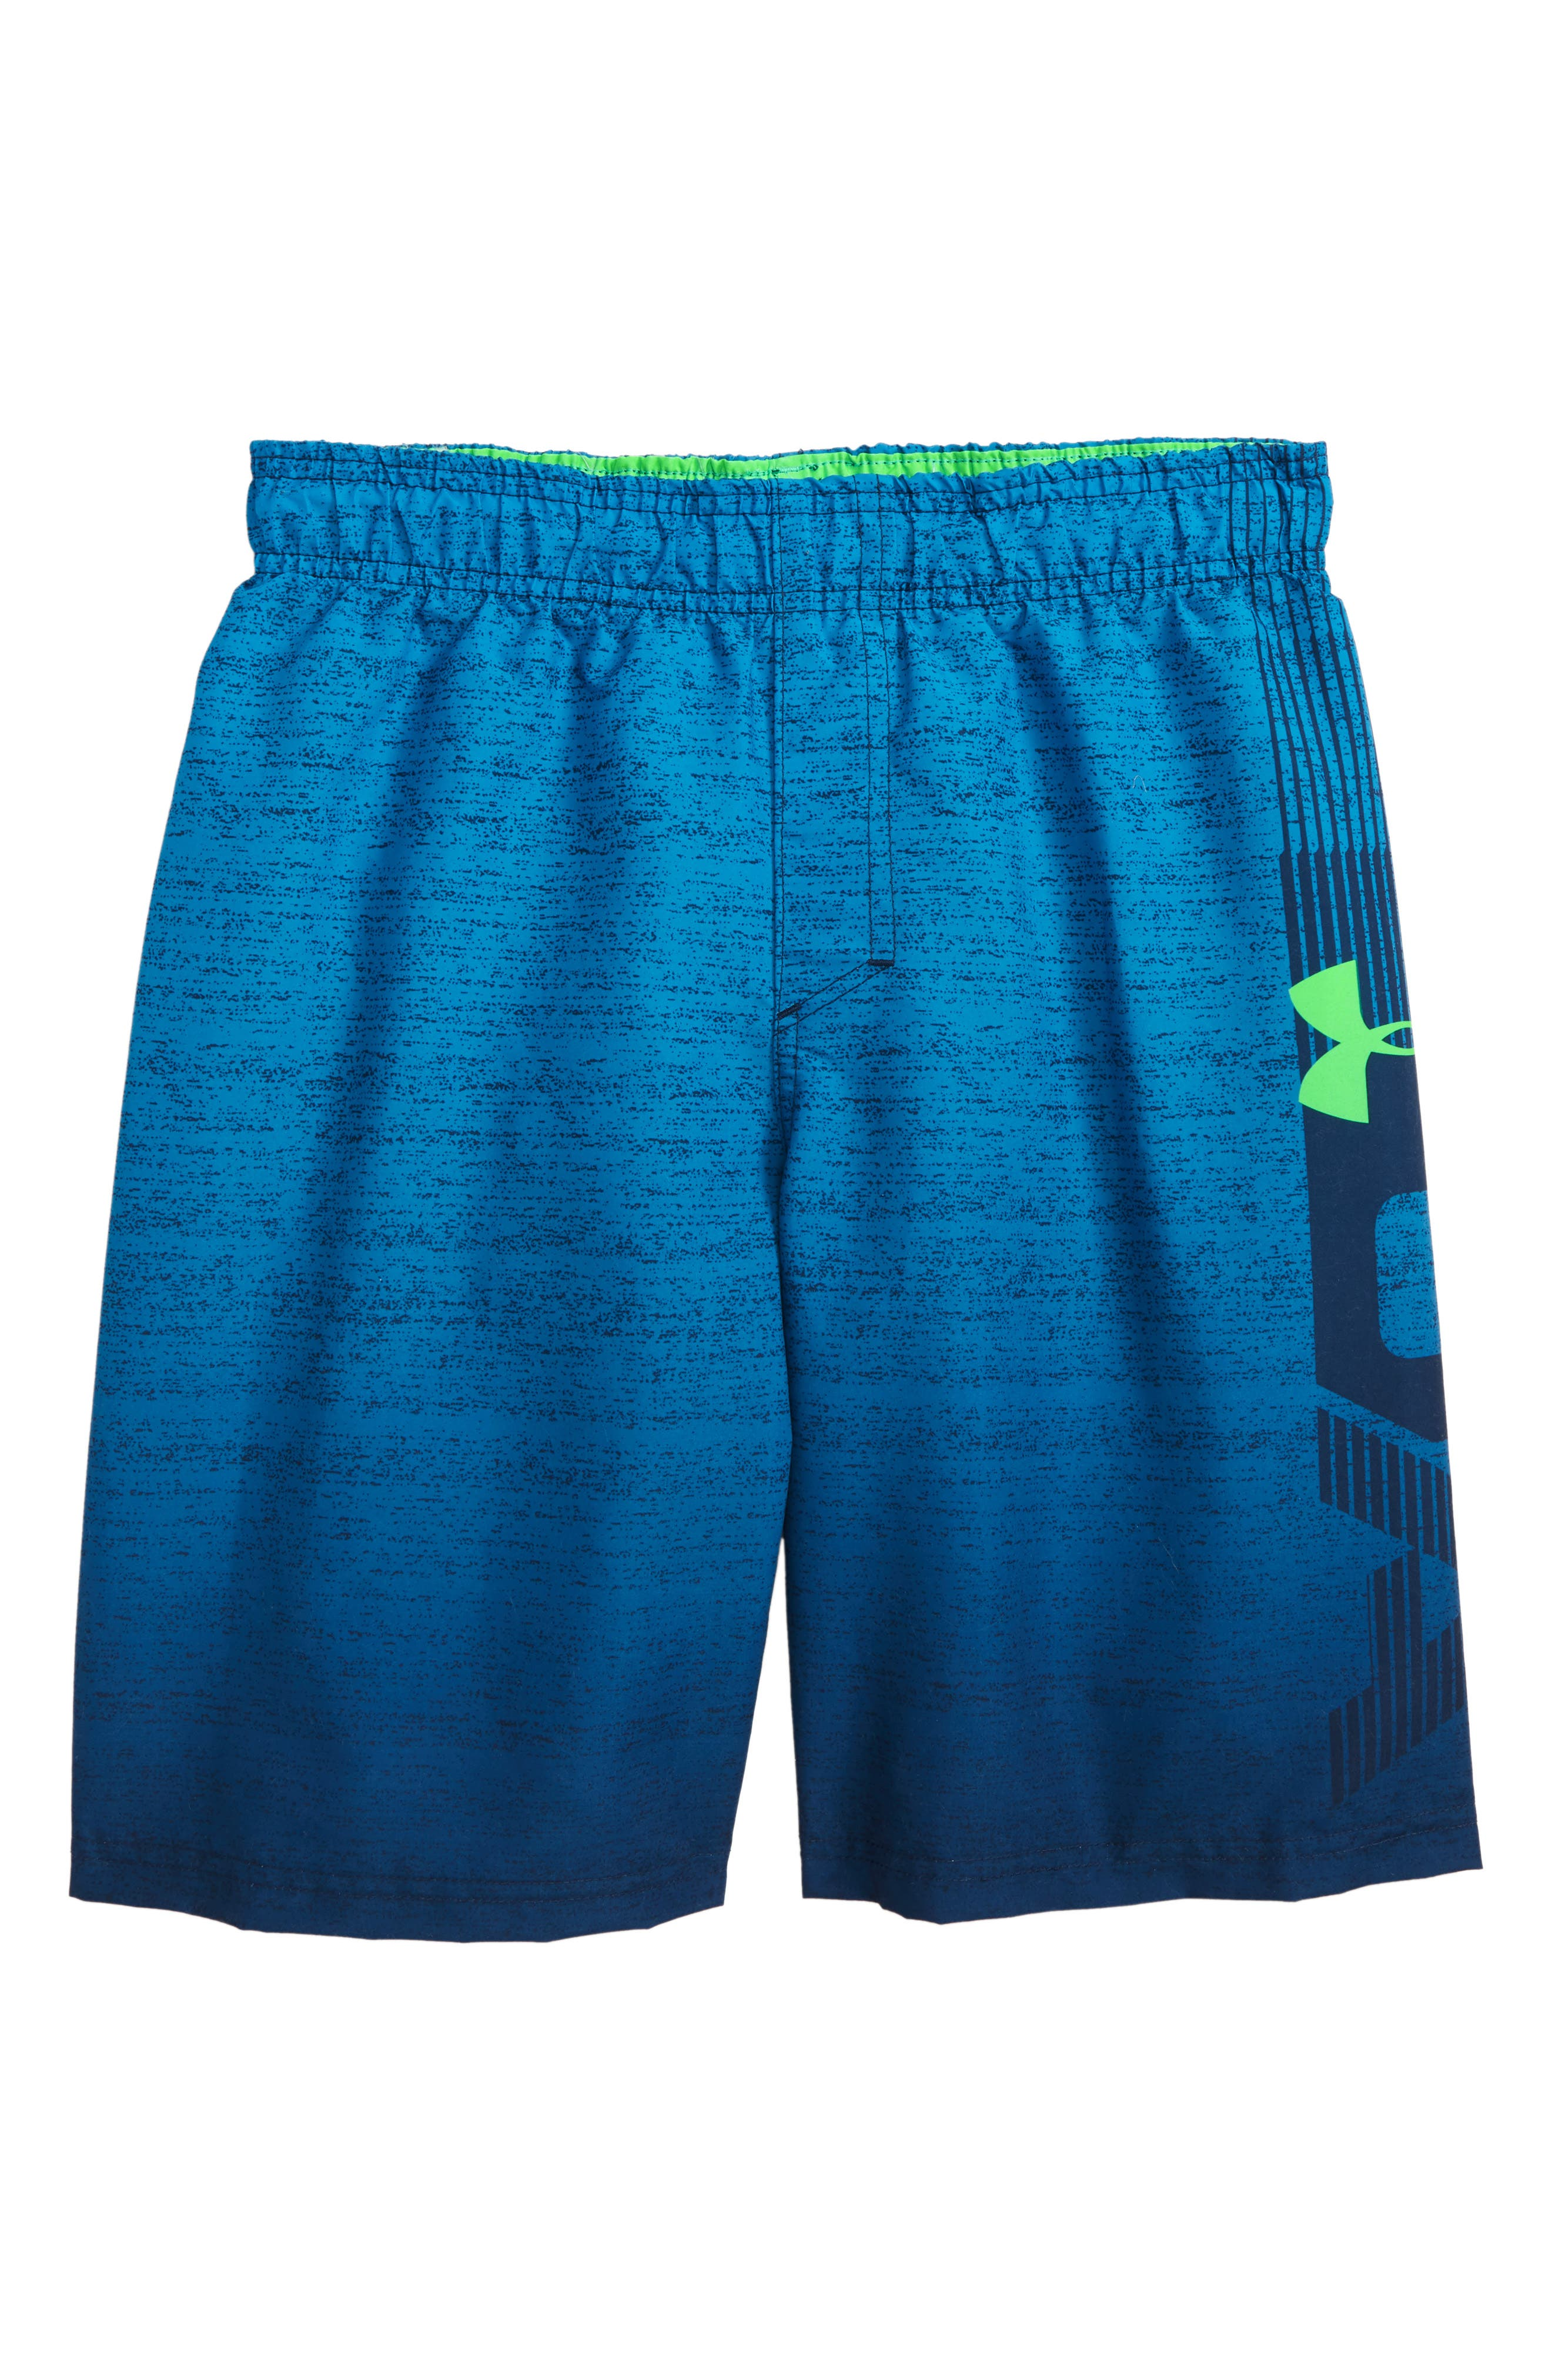 Dipper HeatGear<sup>®</sup> Volley Shorts,                             Main thumbnail 1, color,                             410